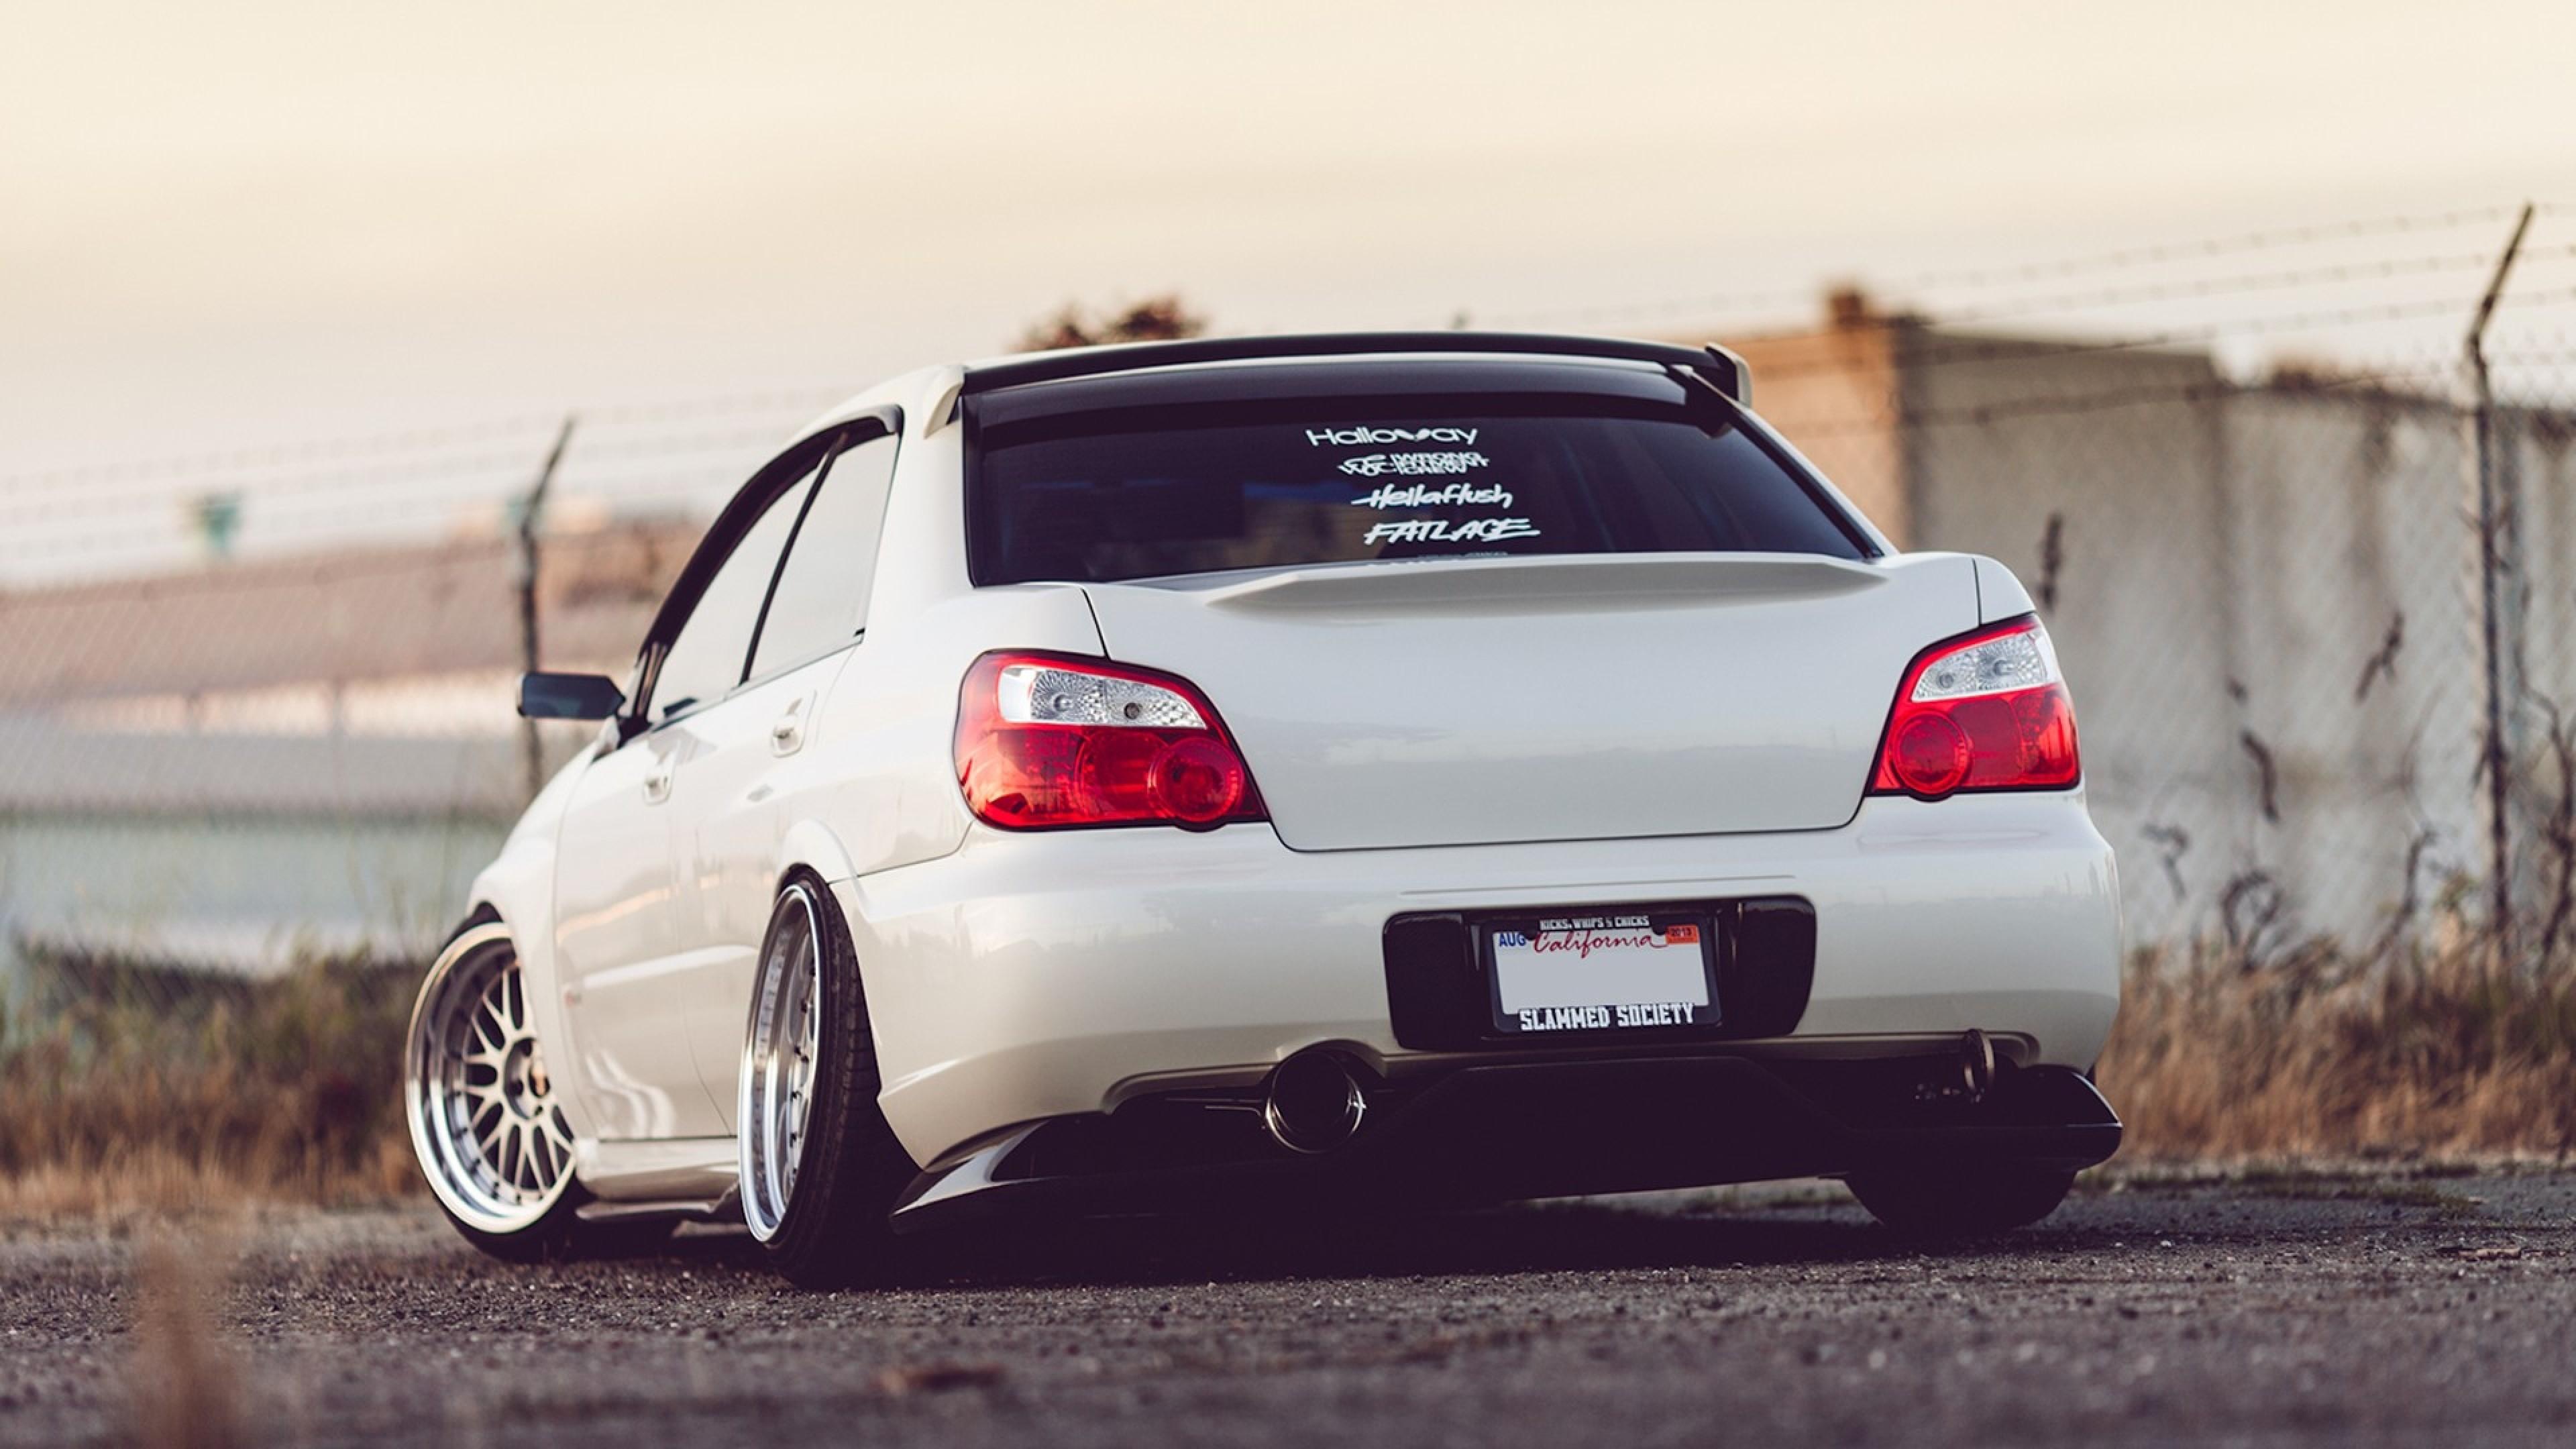 Subaru Impreza Wrx Sti Wallpaper Wallpapertag